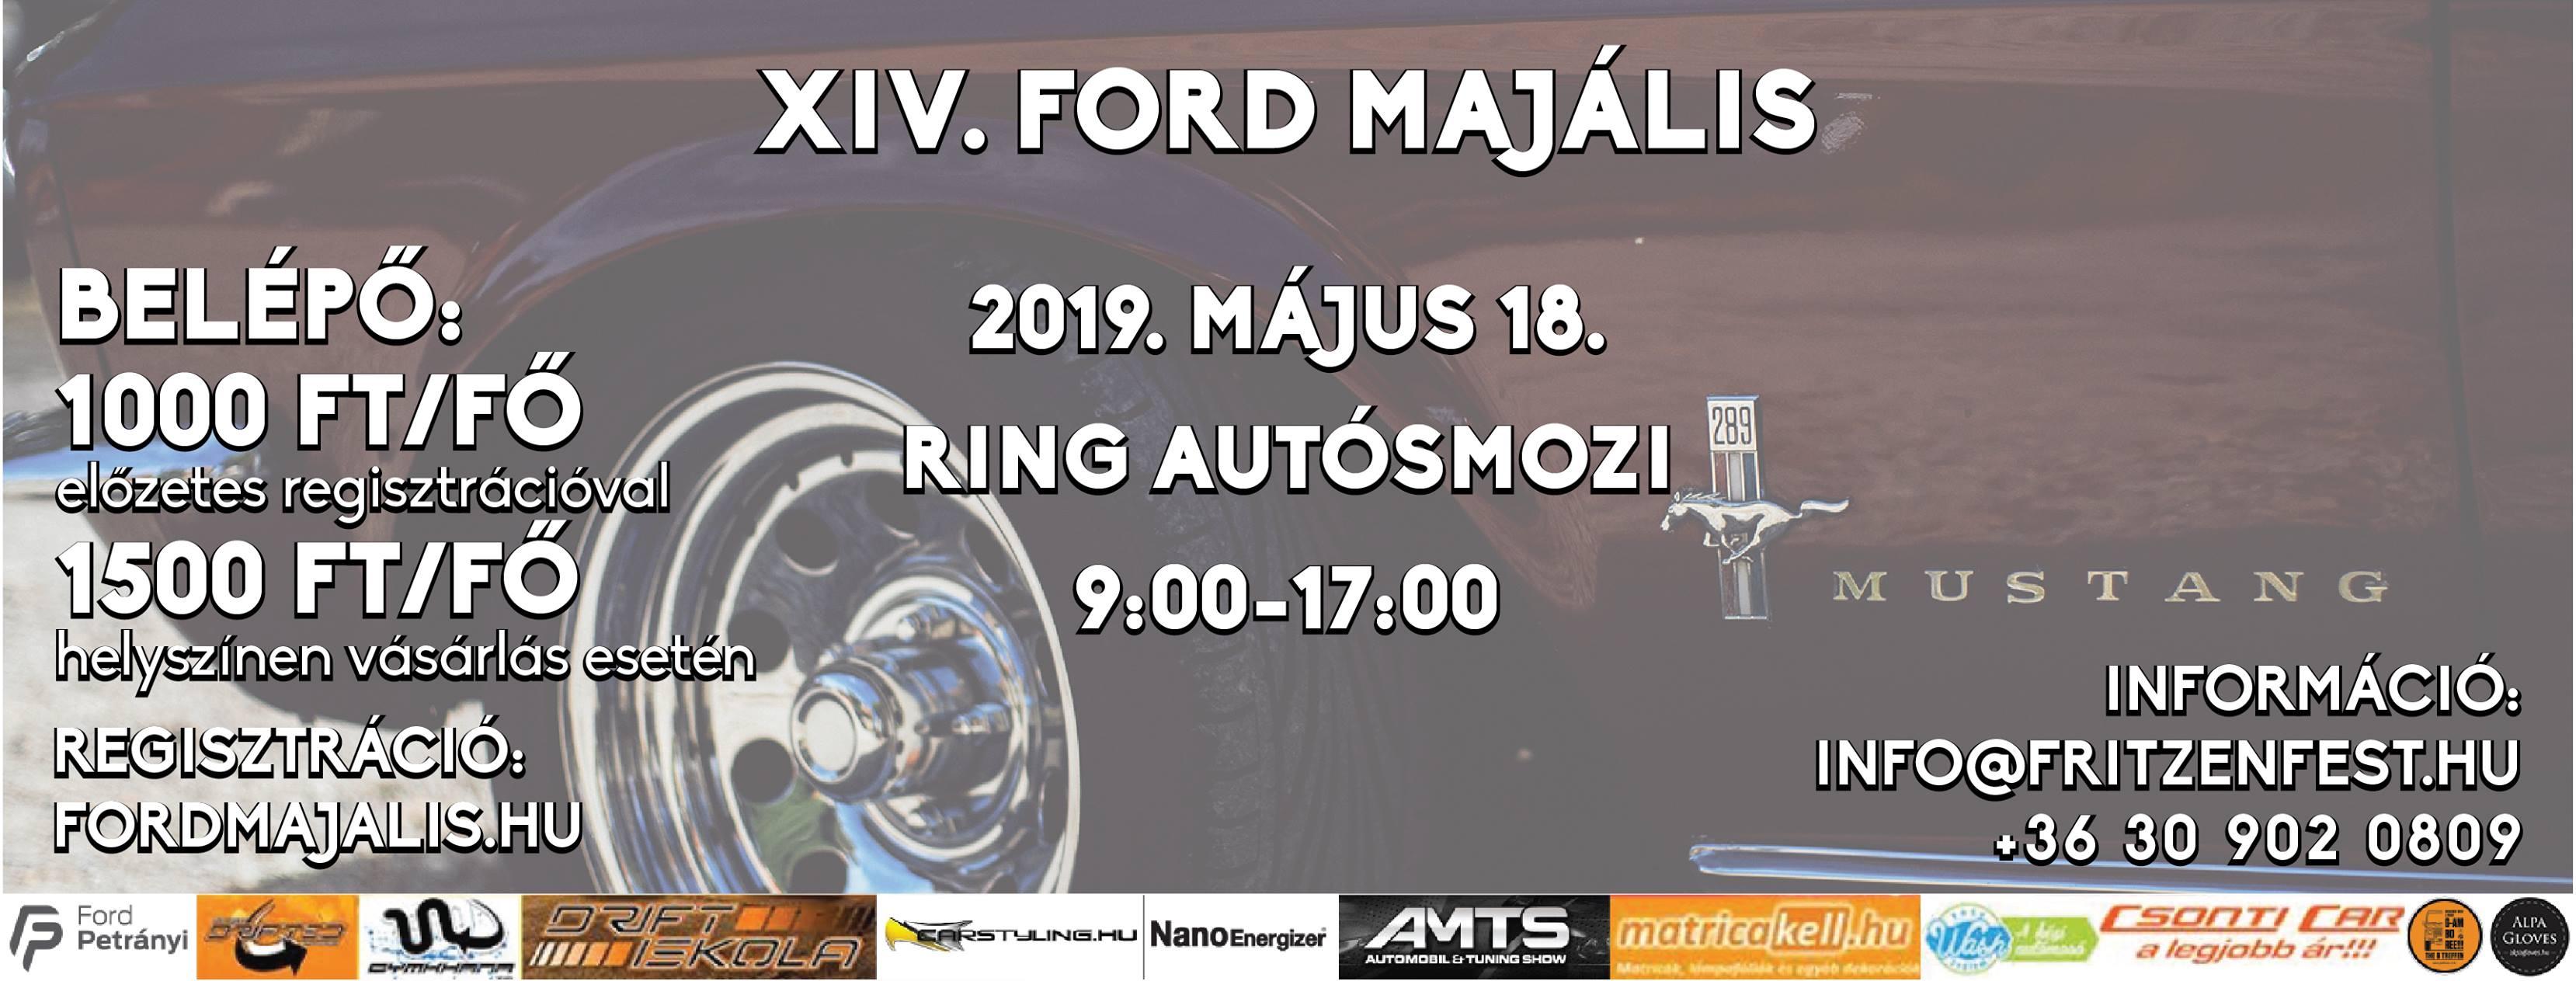 XIV. Ford Majális – Mogyoród – május 18.